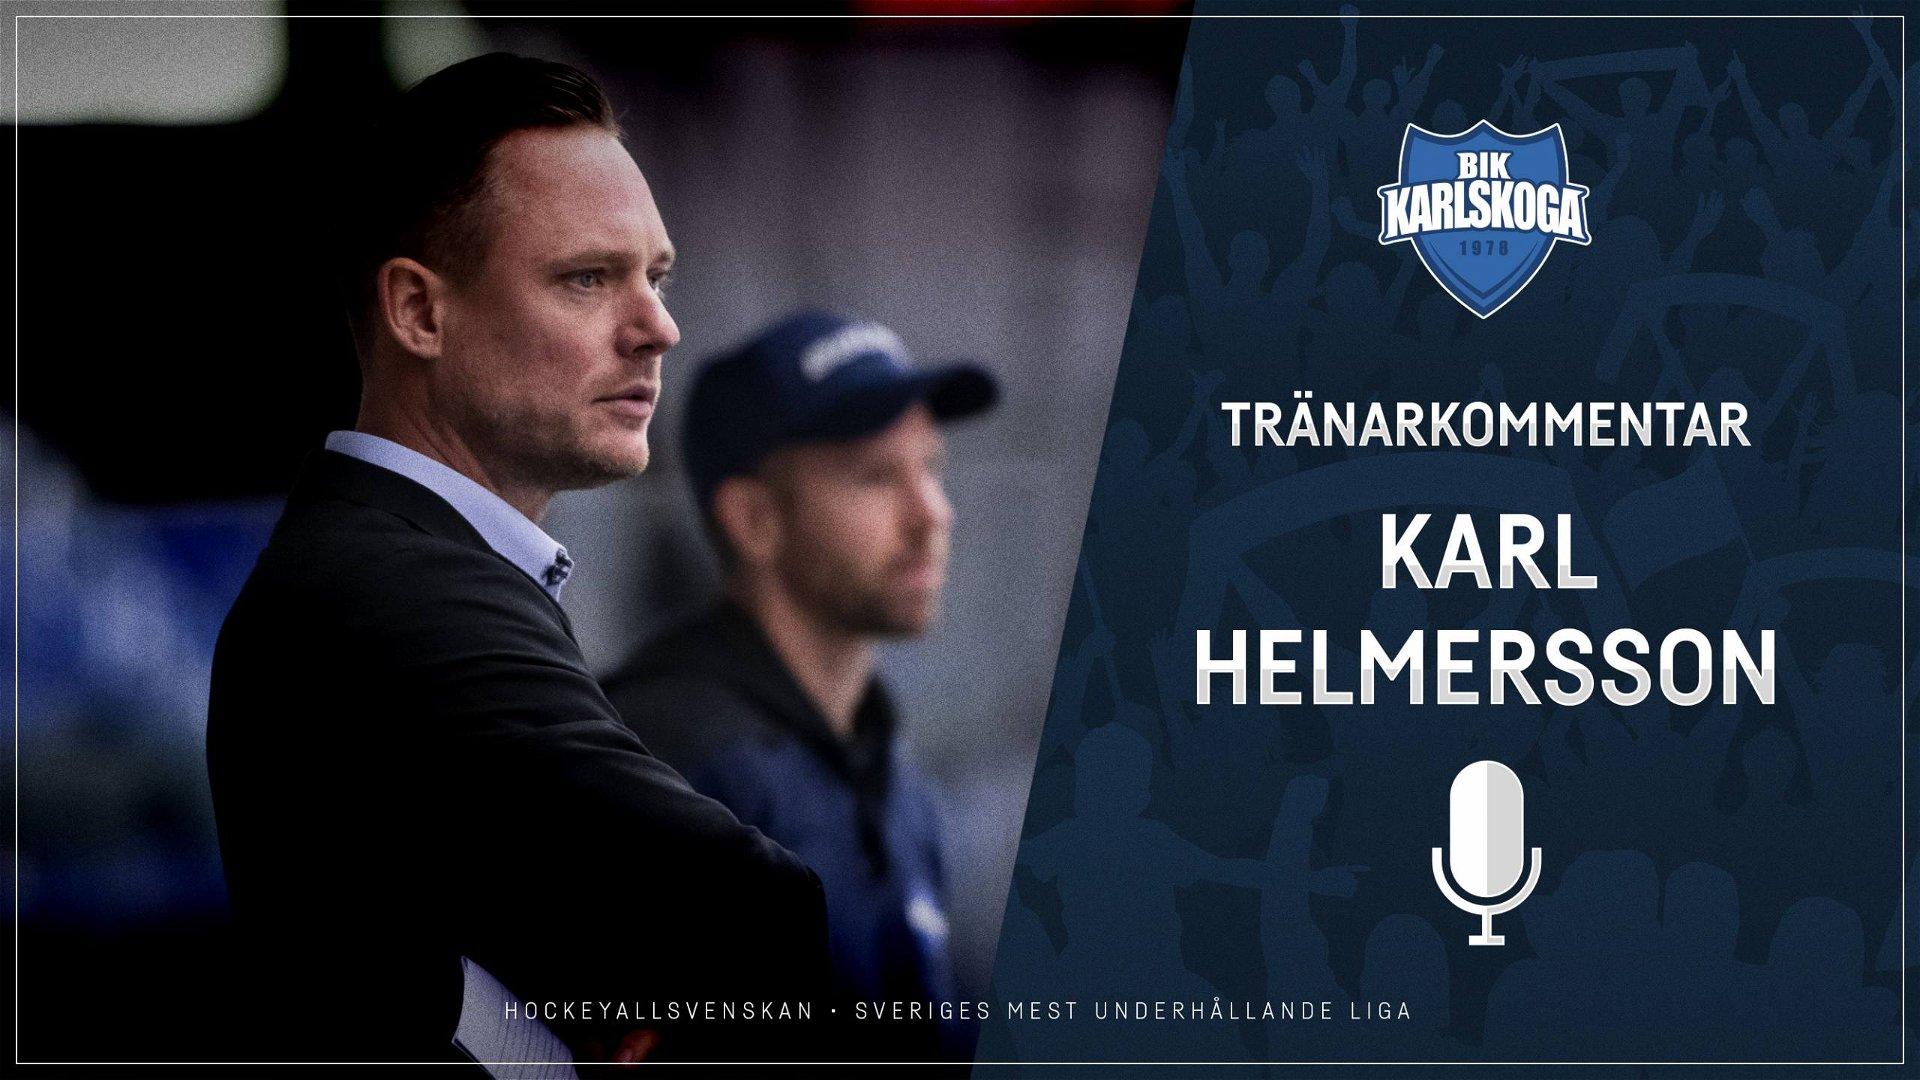 2020-12-26 Segerintervju: Karl Helmersson